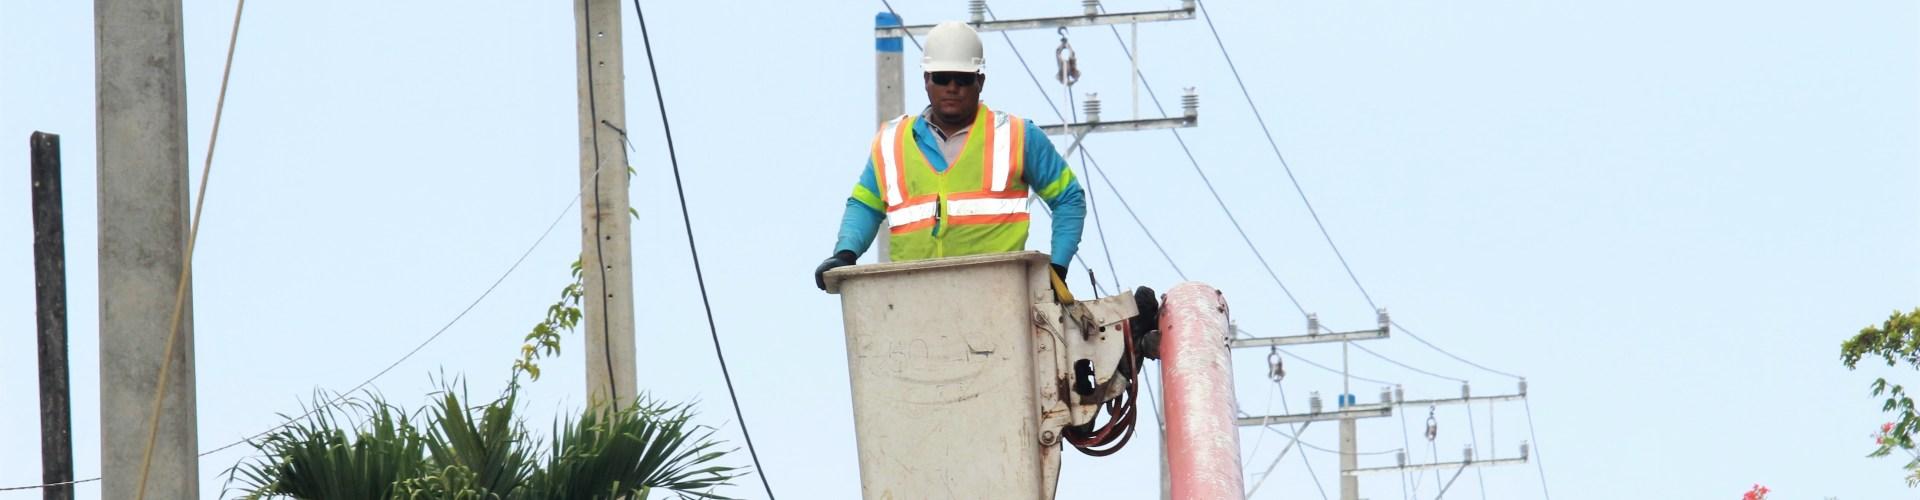 Edenorte rehabilita redes en Villa Tapia